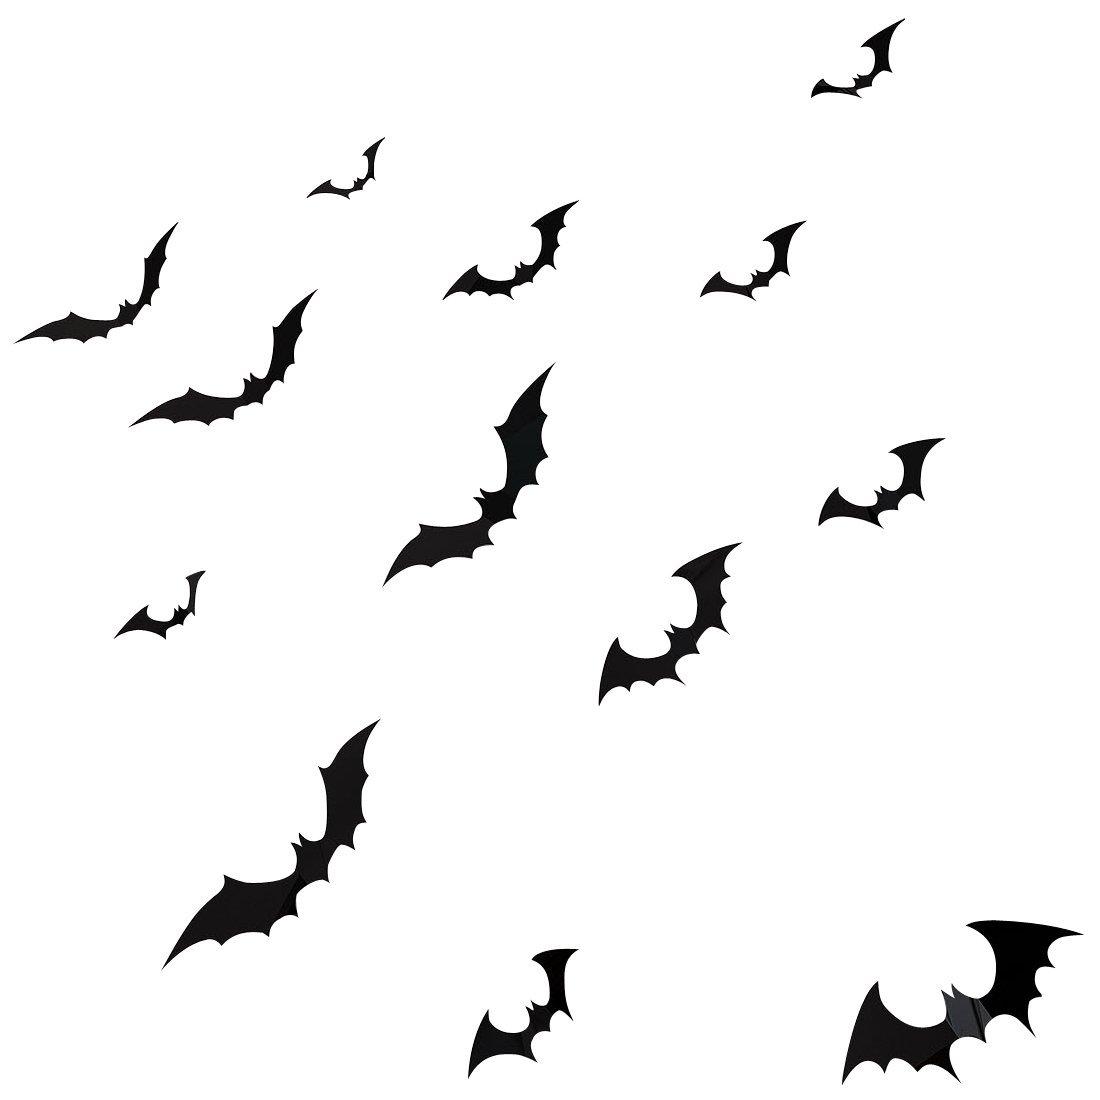 YINGKAI DIY Halloween Party 15pcs/pack Black PVC 3D Decorative Bats Butterfly Wall Decal Wall Sticker, Halloween Eve Decor Home Window Decoration